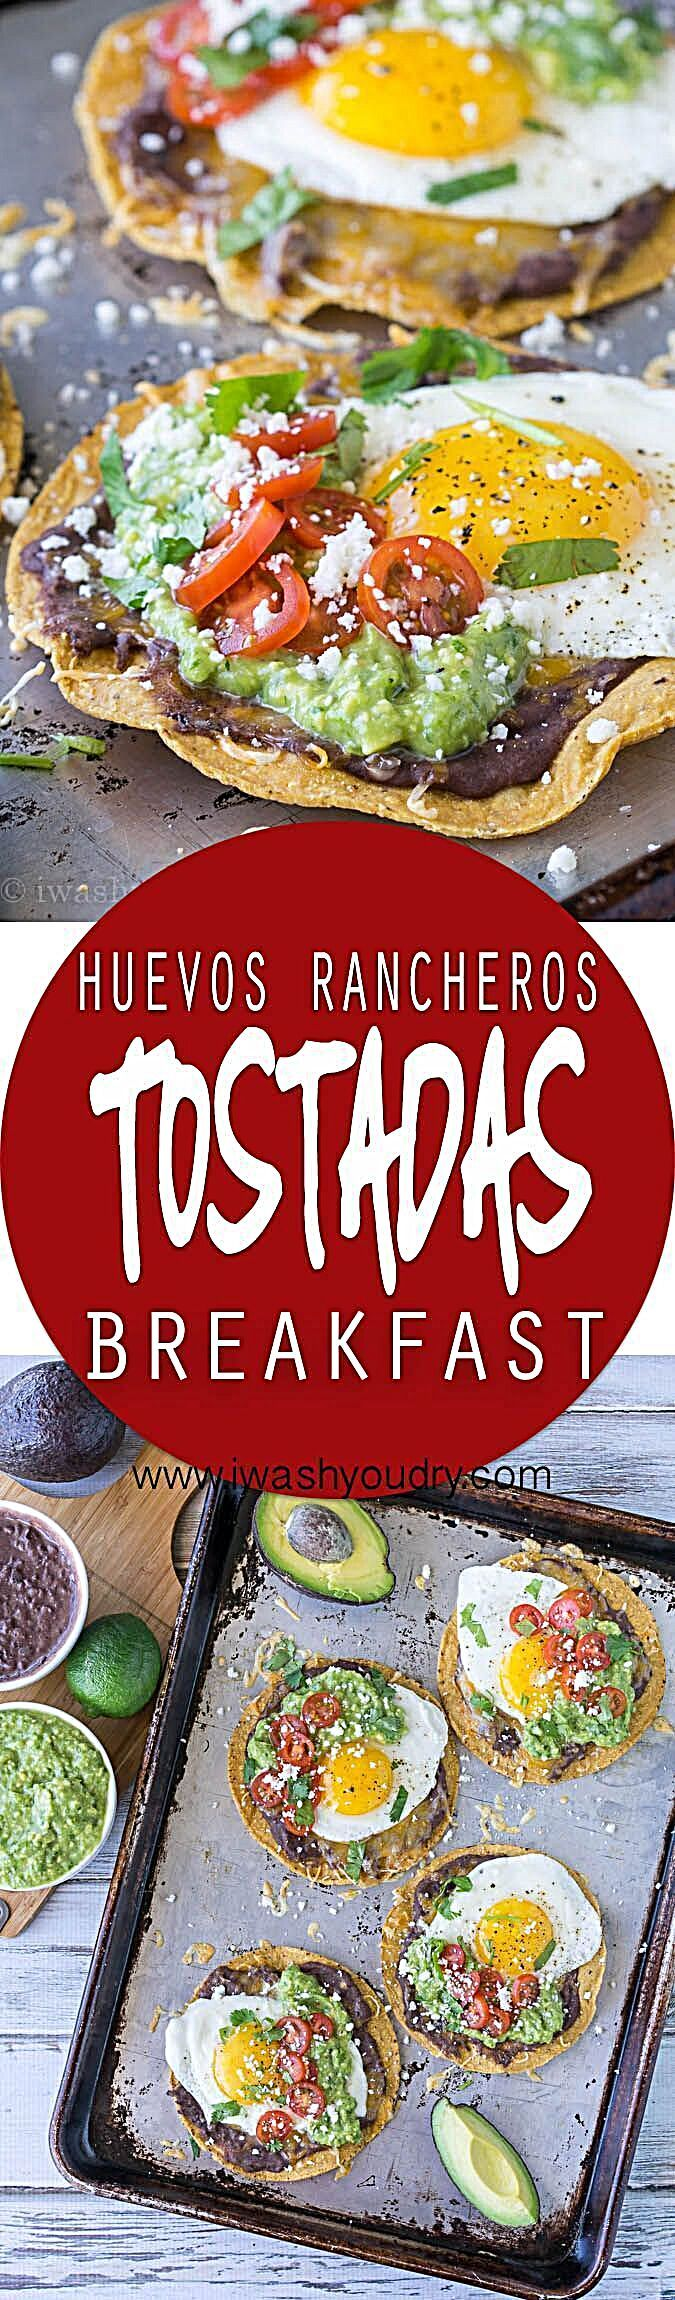 Forget that trendy avocado toast, these Huevos Rancheros Breakfast Tostadas with Avocado Salsa Verde...